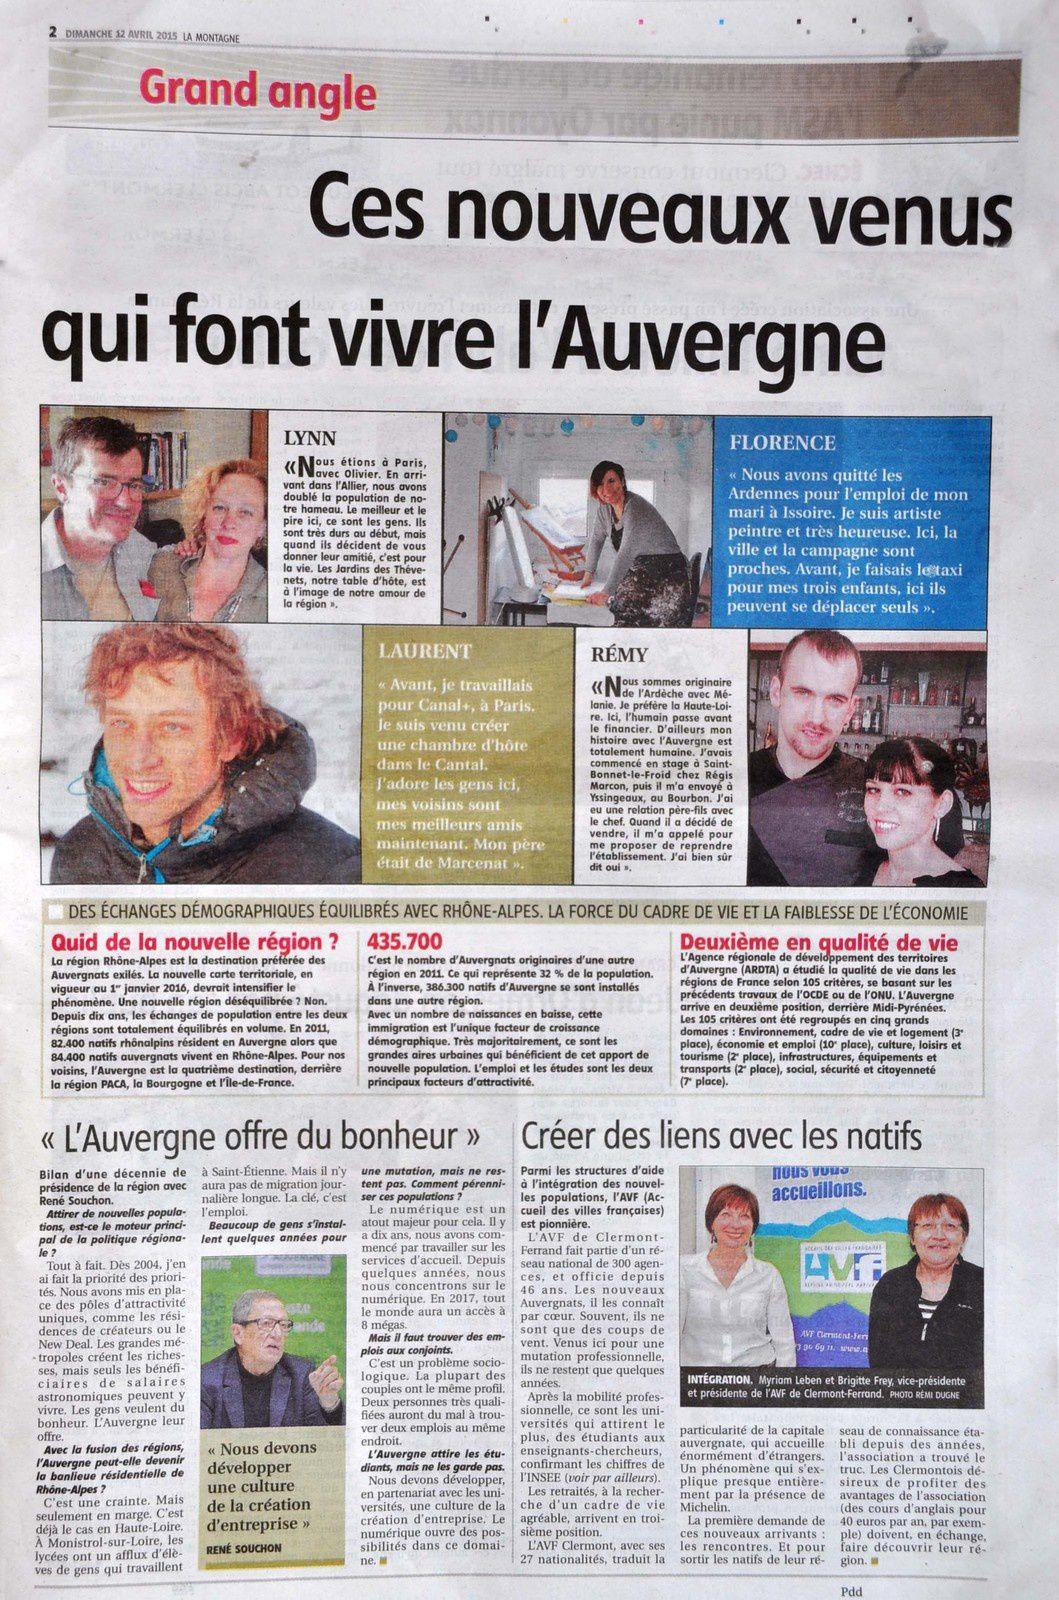 Journal La Montagne - Artiste FloM